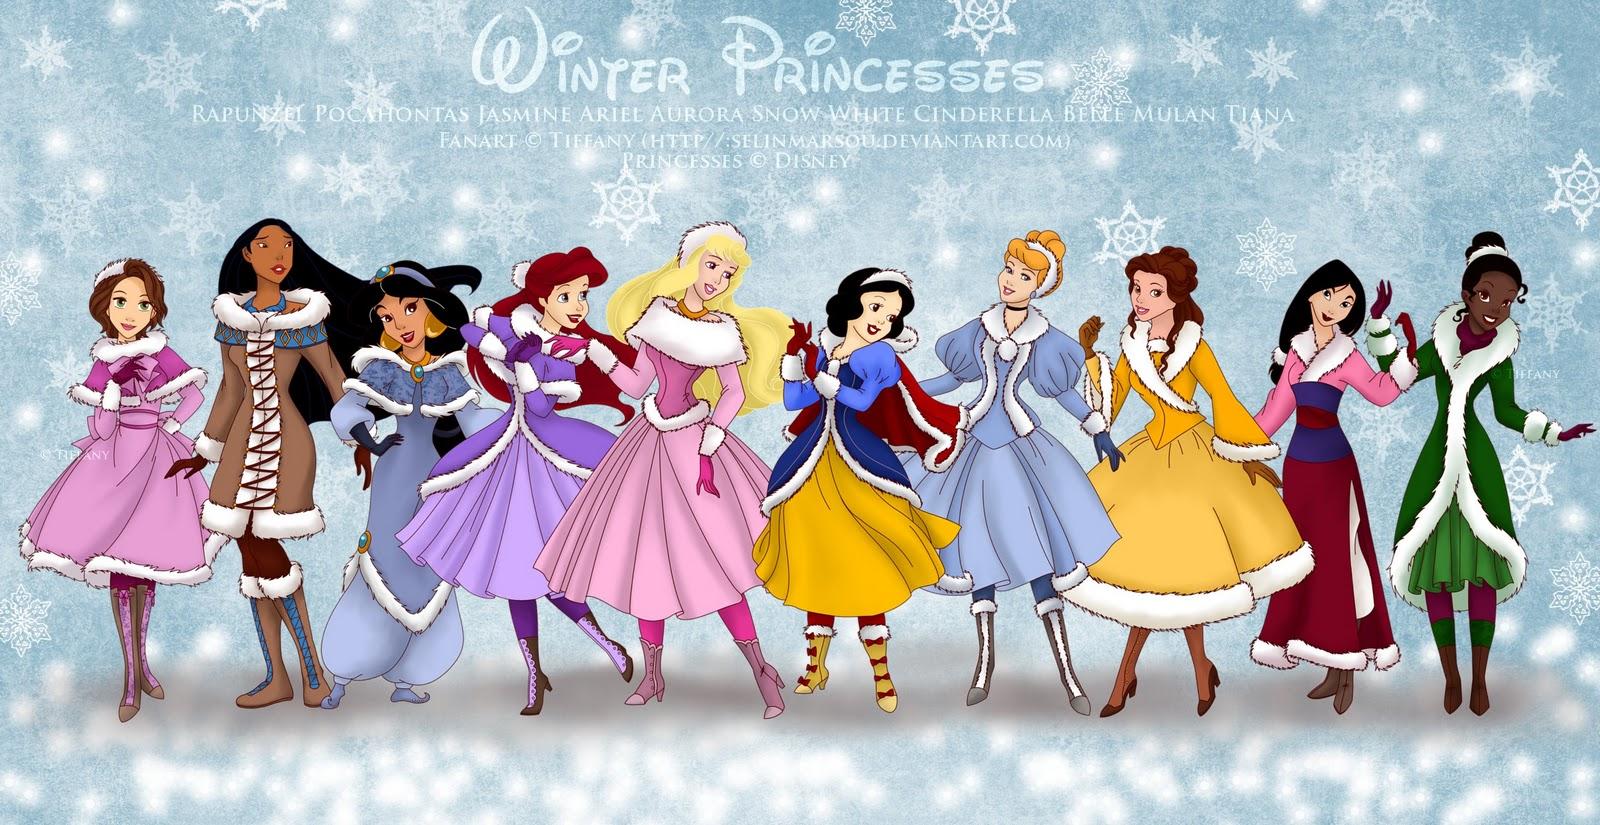 http://3.bp.blogspot.com/-IKALUHAnstk/Tylupk0SNOI/AAAAAAAADkI/7bO5mrQnvgg/s1600/Princesas_Disney__winter_princesses_by_selinmarsou.jpg